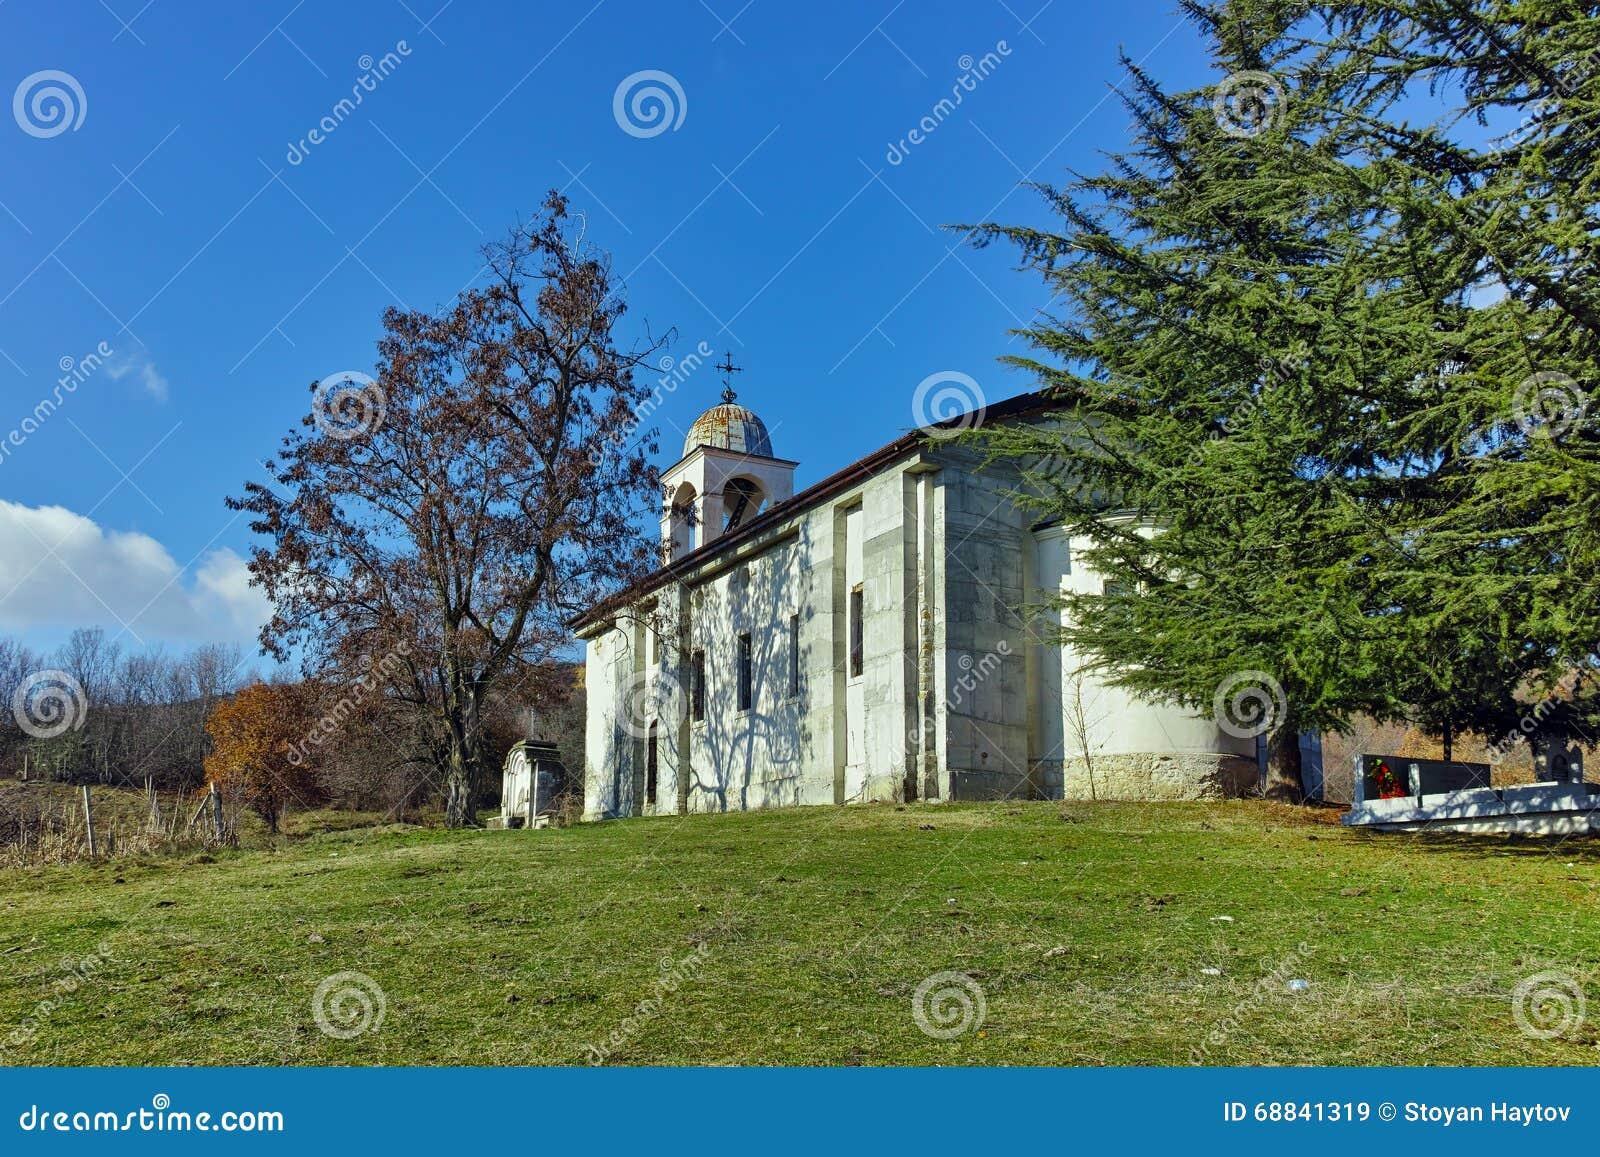 The grave of Yane Sandanski and old church near Rozhen Monastery, Bulgaria